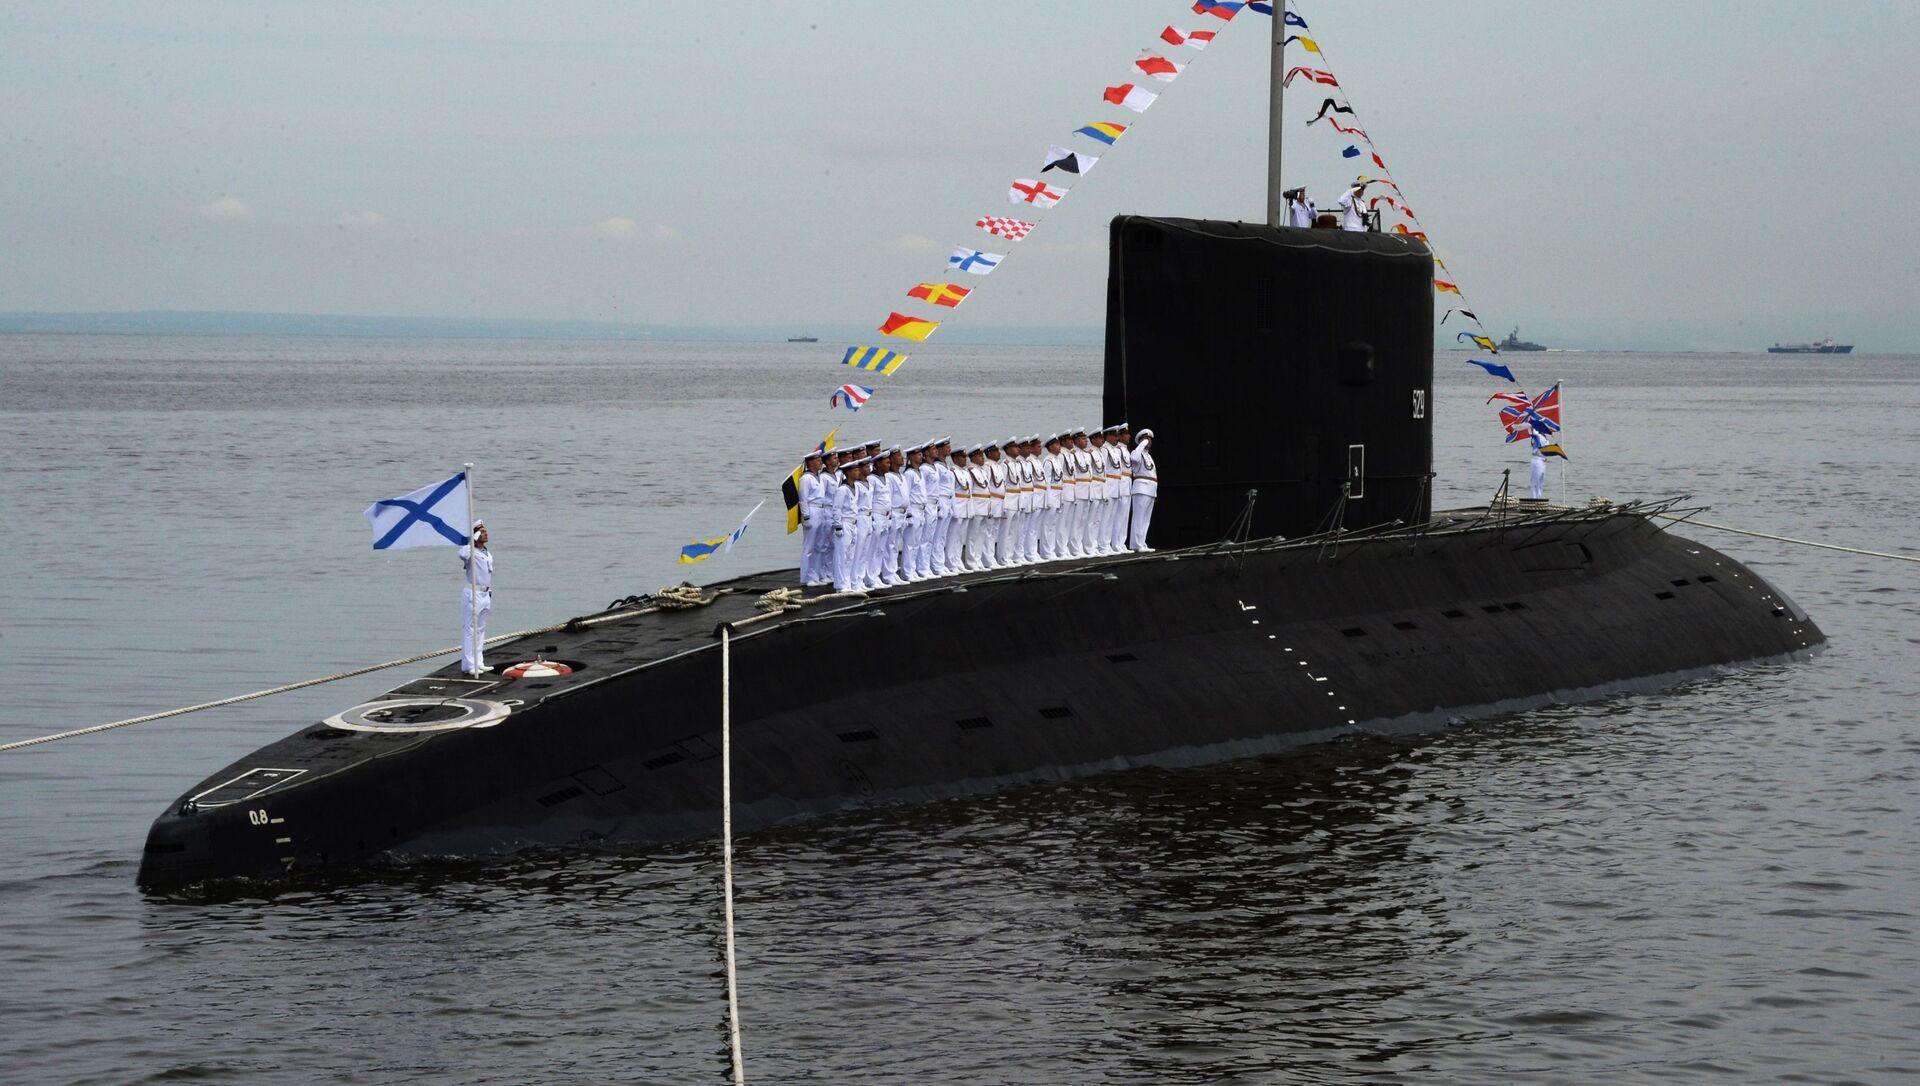 Tàu ngầm Varshavyanka của Nga - Sputnik Việt Nam, 1920, 21.09.2021